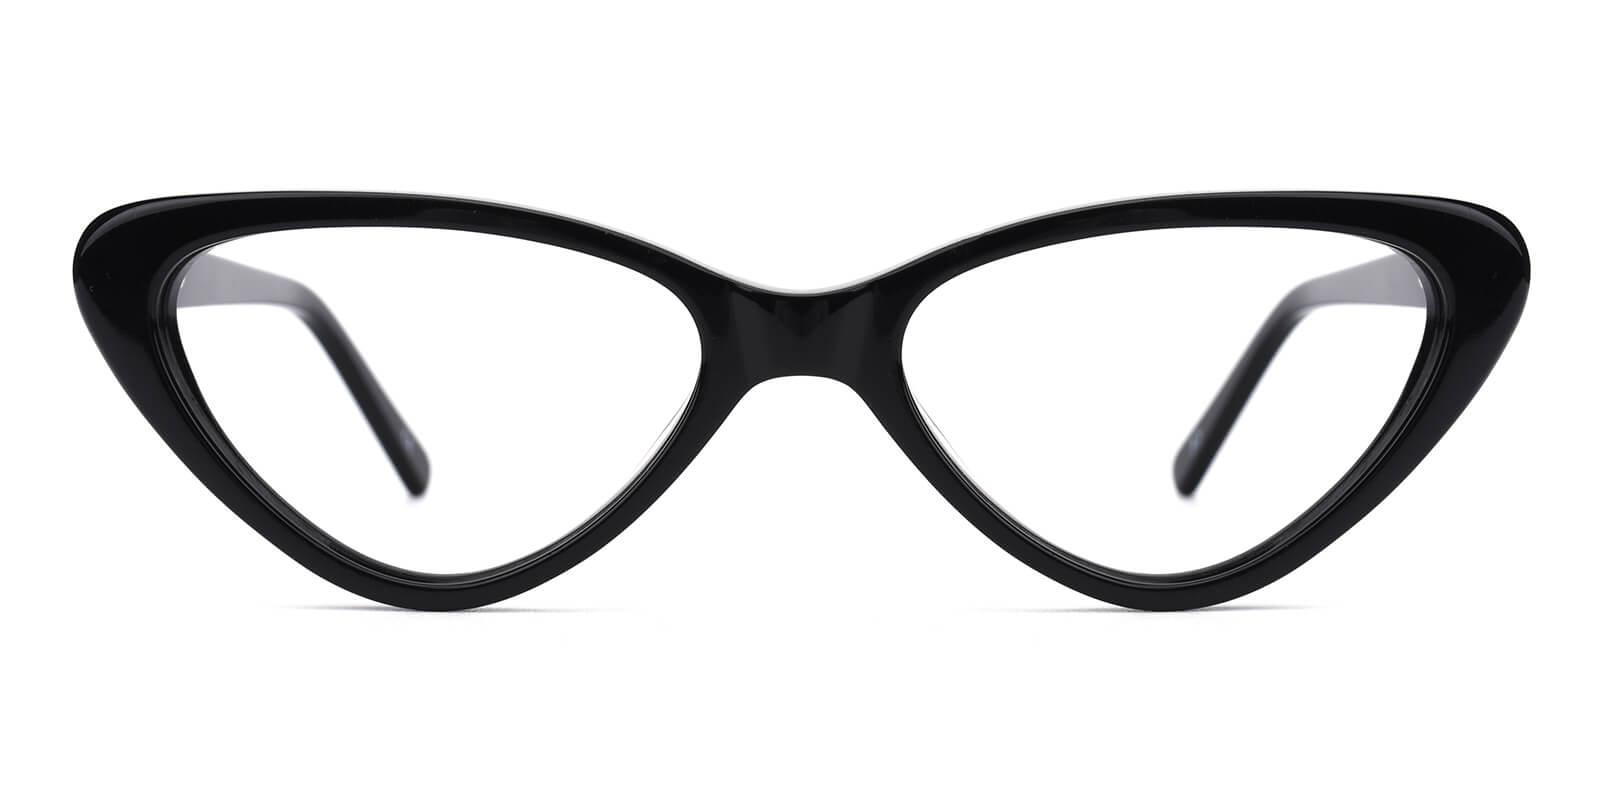 Catalin-Black-Cat-Acetate-Eyeglasses-additional2